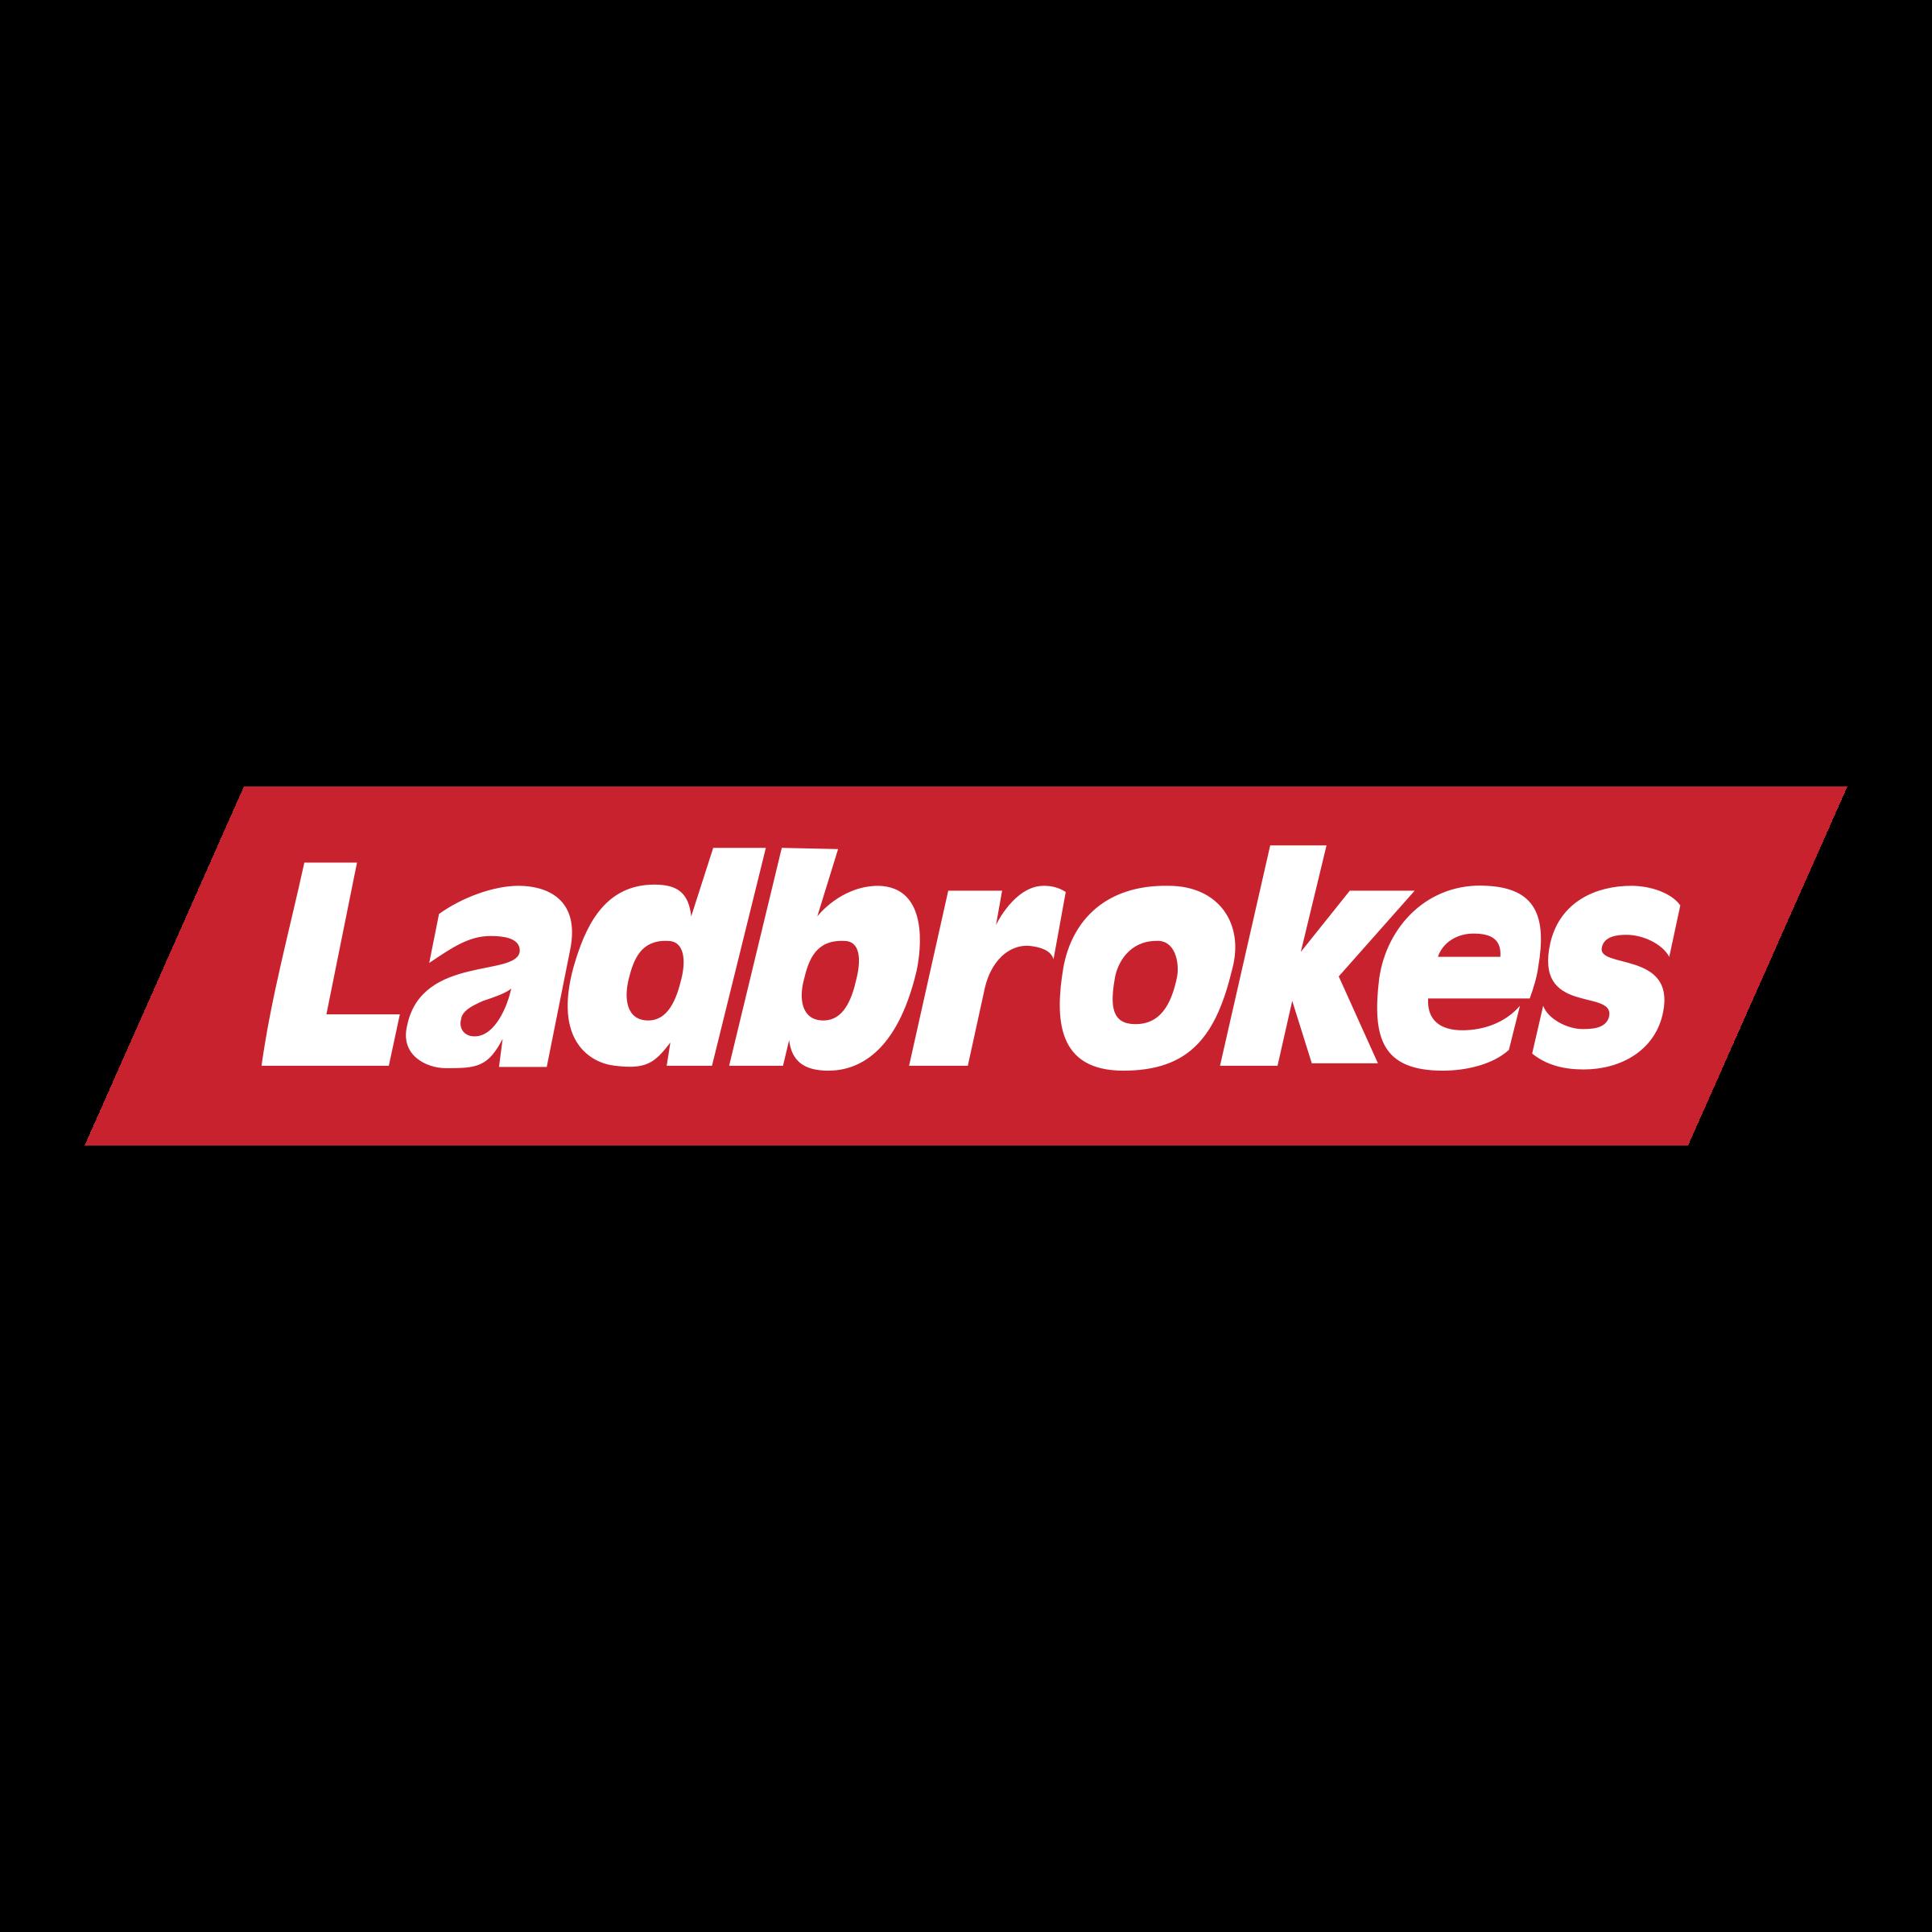 Ladbrokes Logo PNG Transparent & SVG Vector.